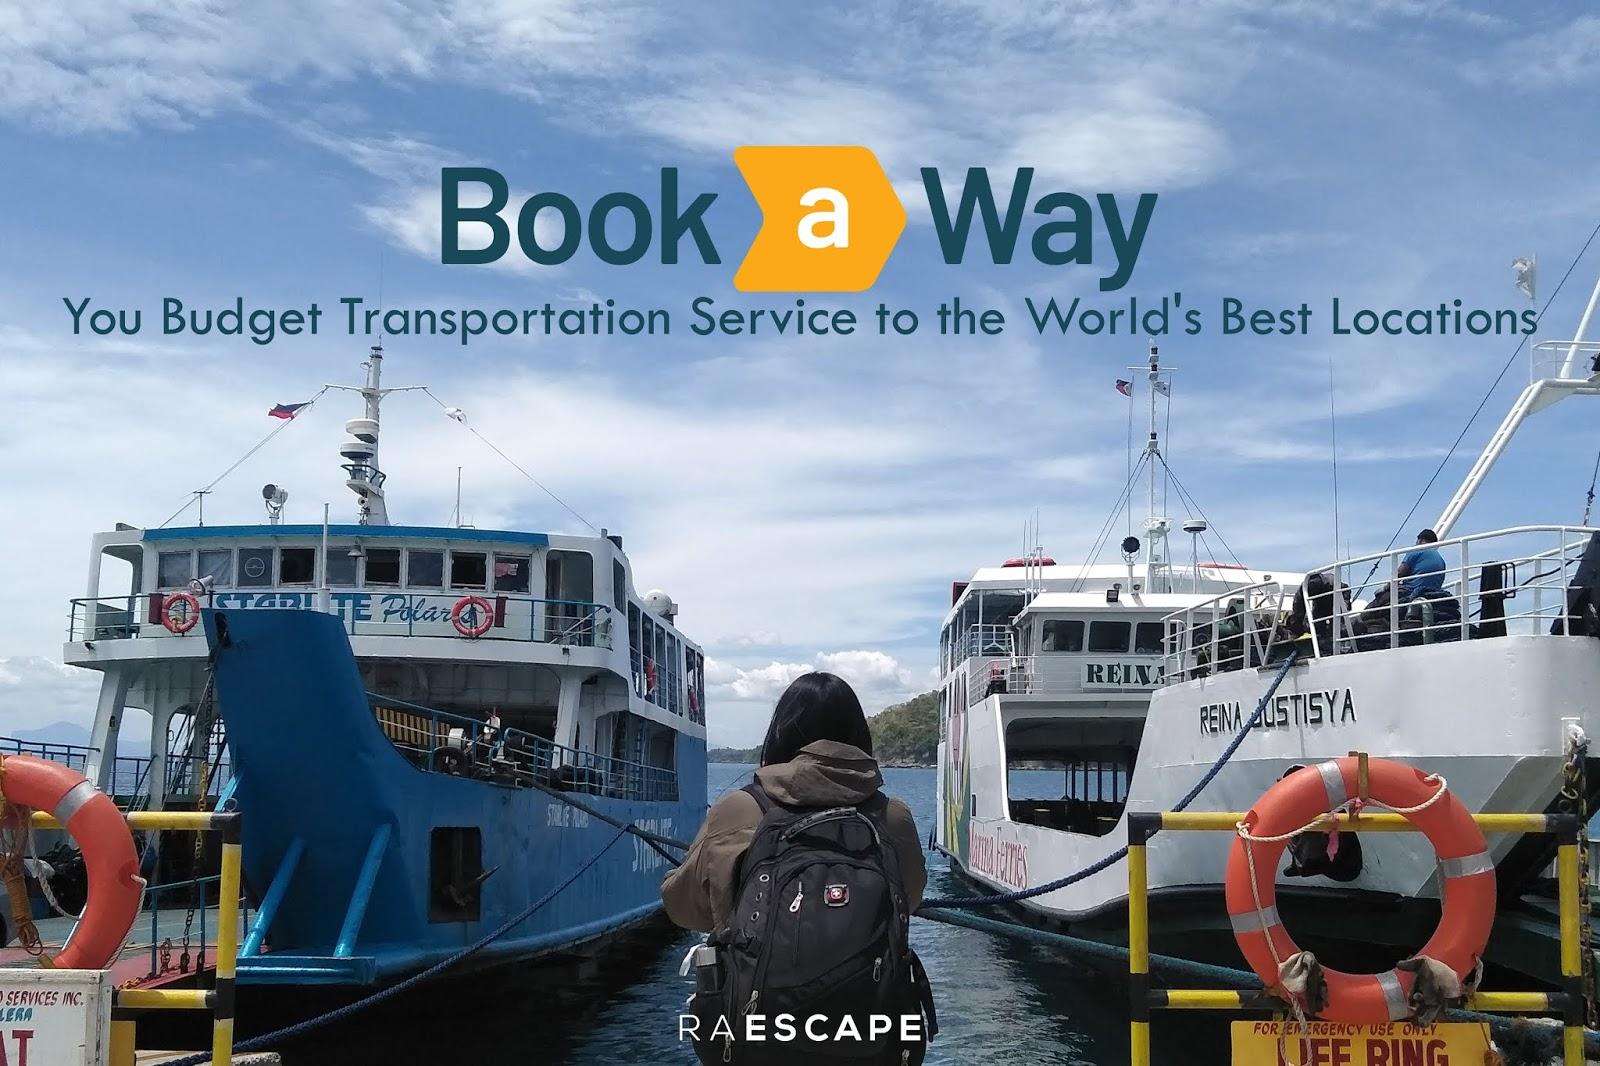 bookaway.com batangas pier balatero pier puerto galera